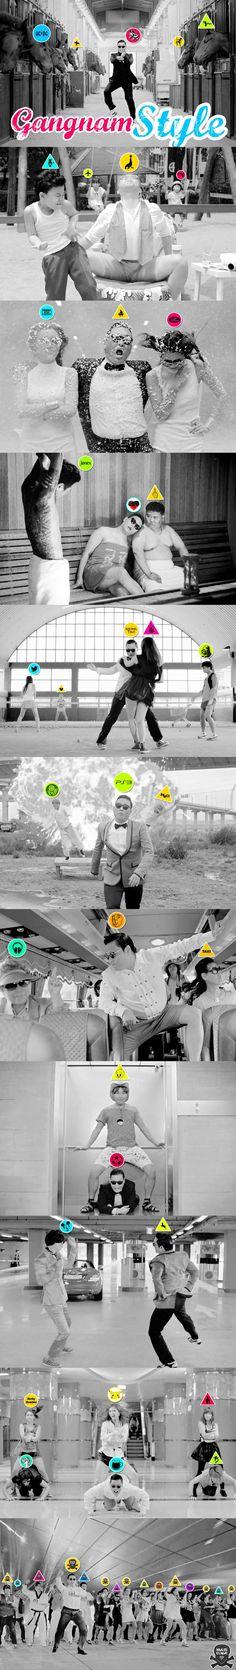 behind the scenes of Gangnam Style